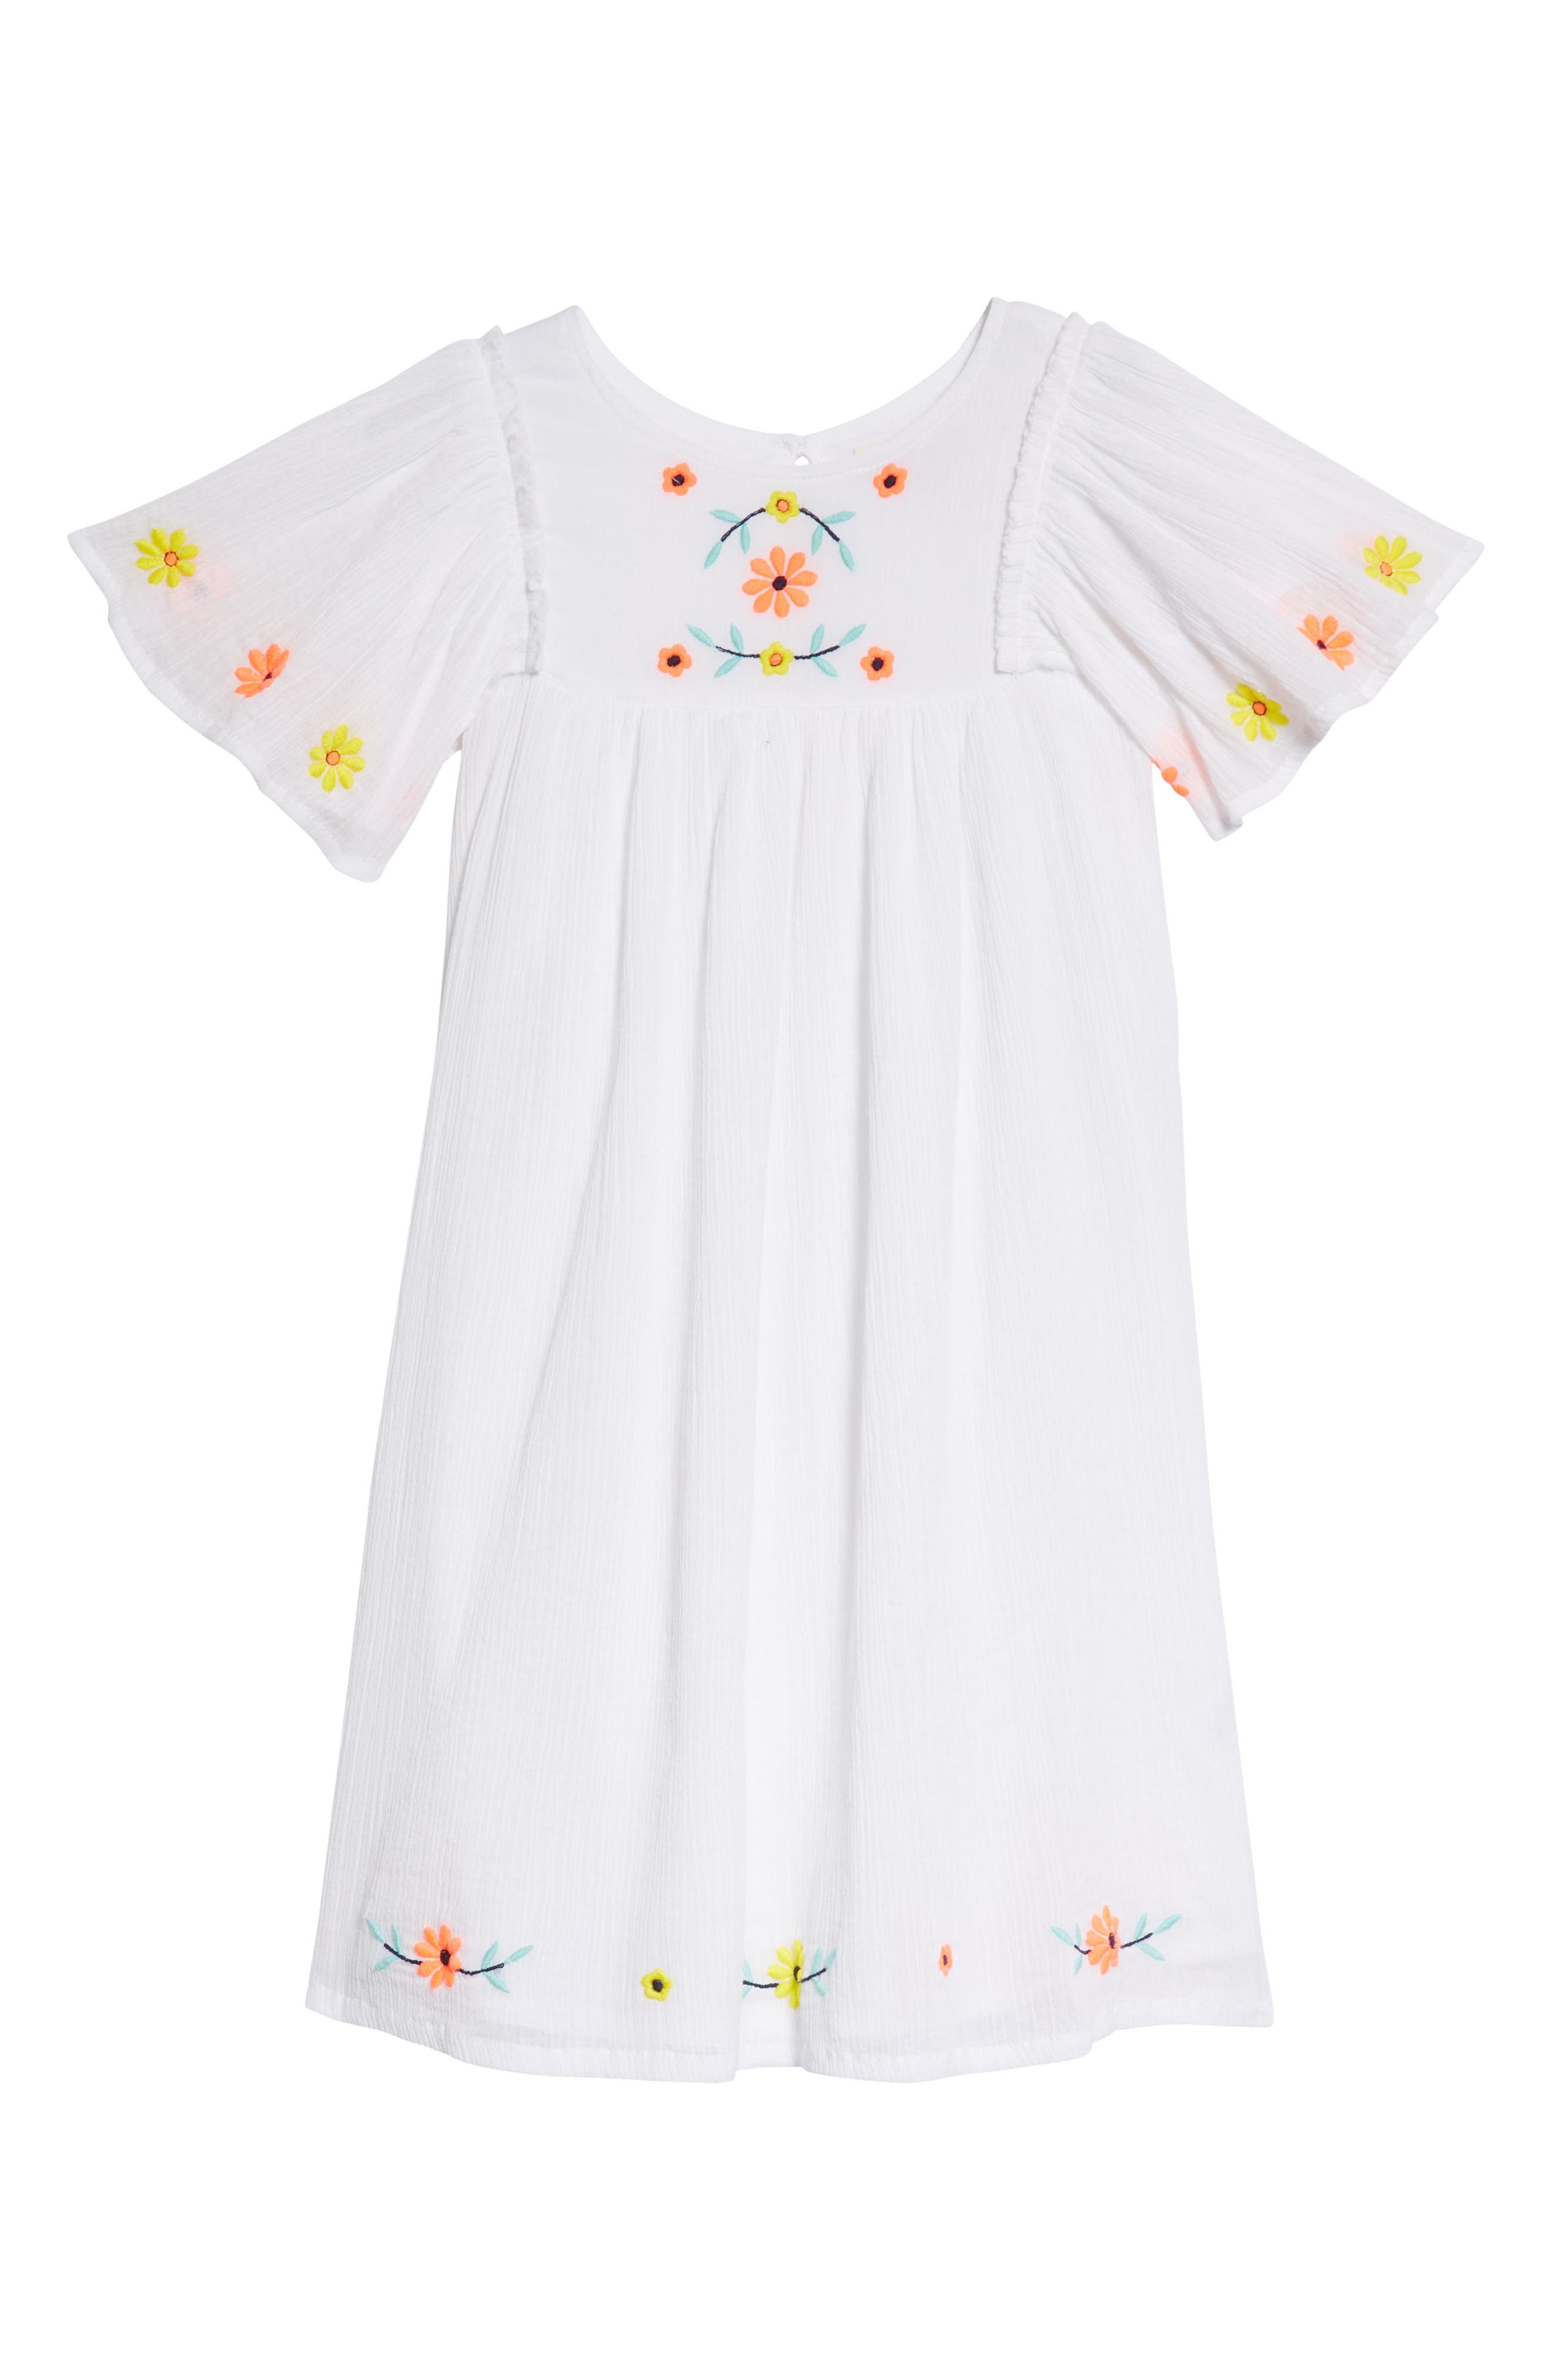 Alternate Image 1 Selected - Tucker + Tate Embroidered Flutter Sleeve Dress (Toddler Girls, Little Girls & Big Girls)